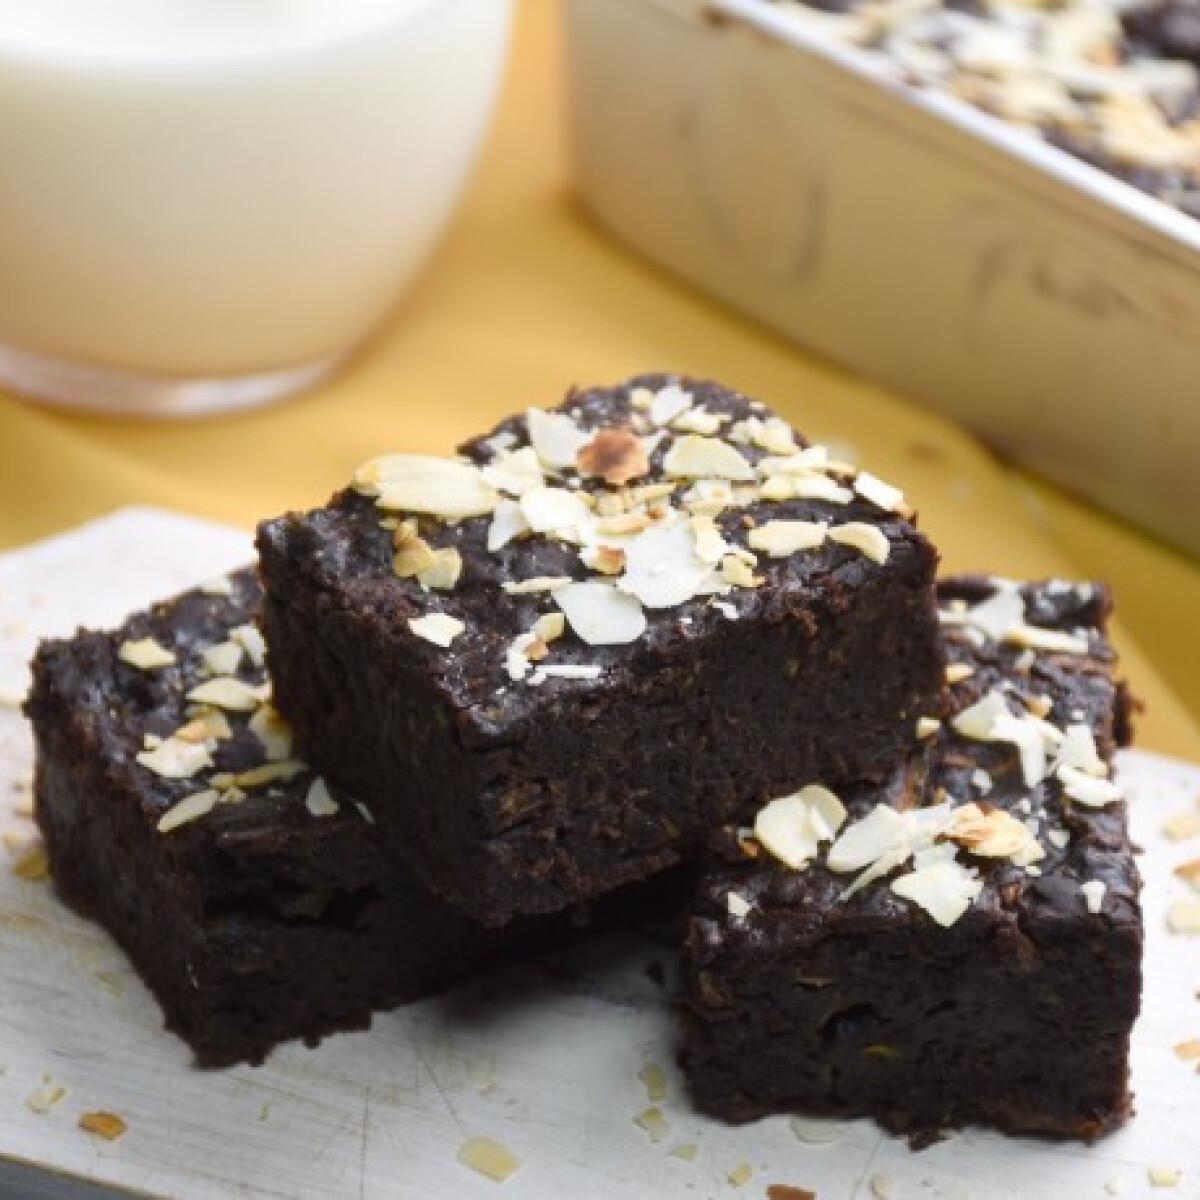 Ezen a képen: Cukkini-brownie